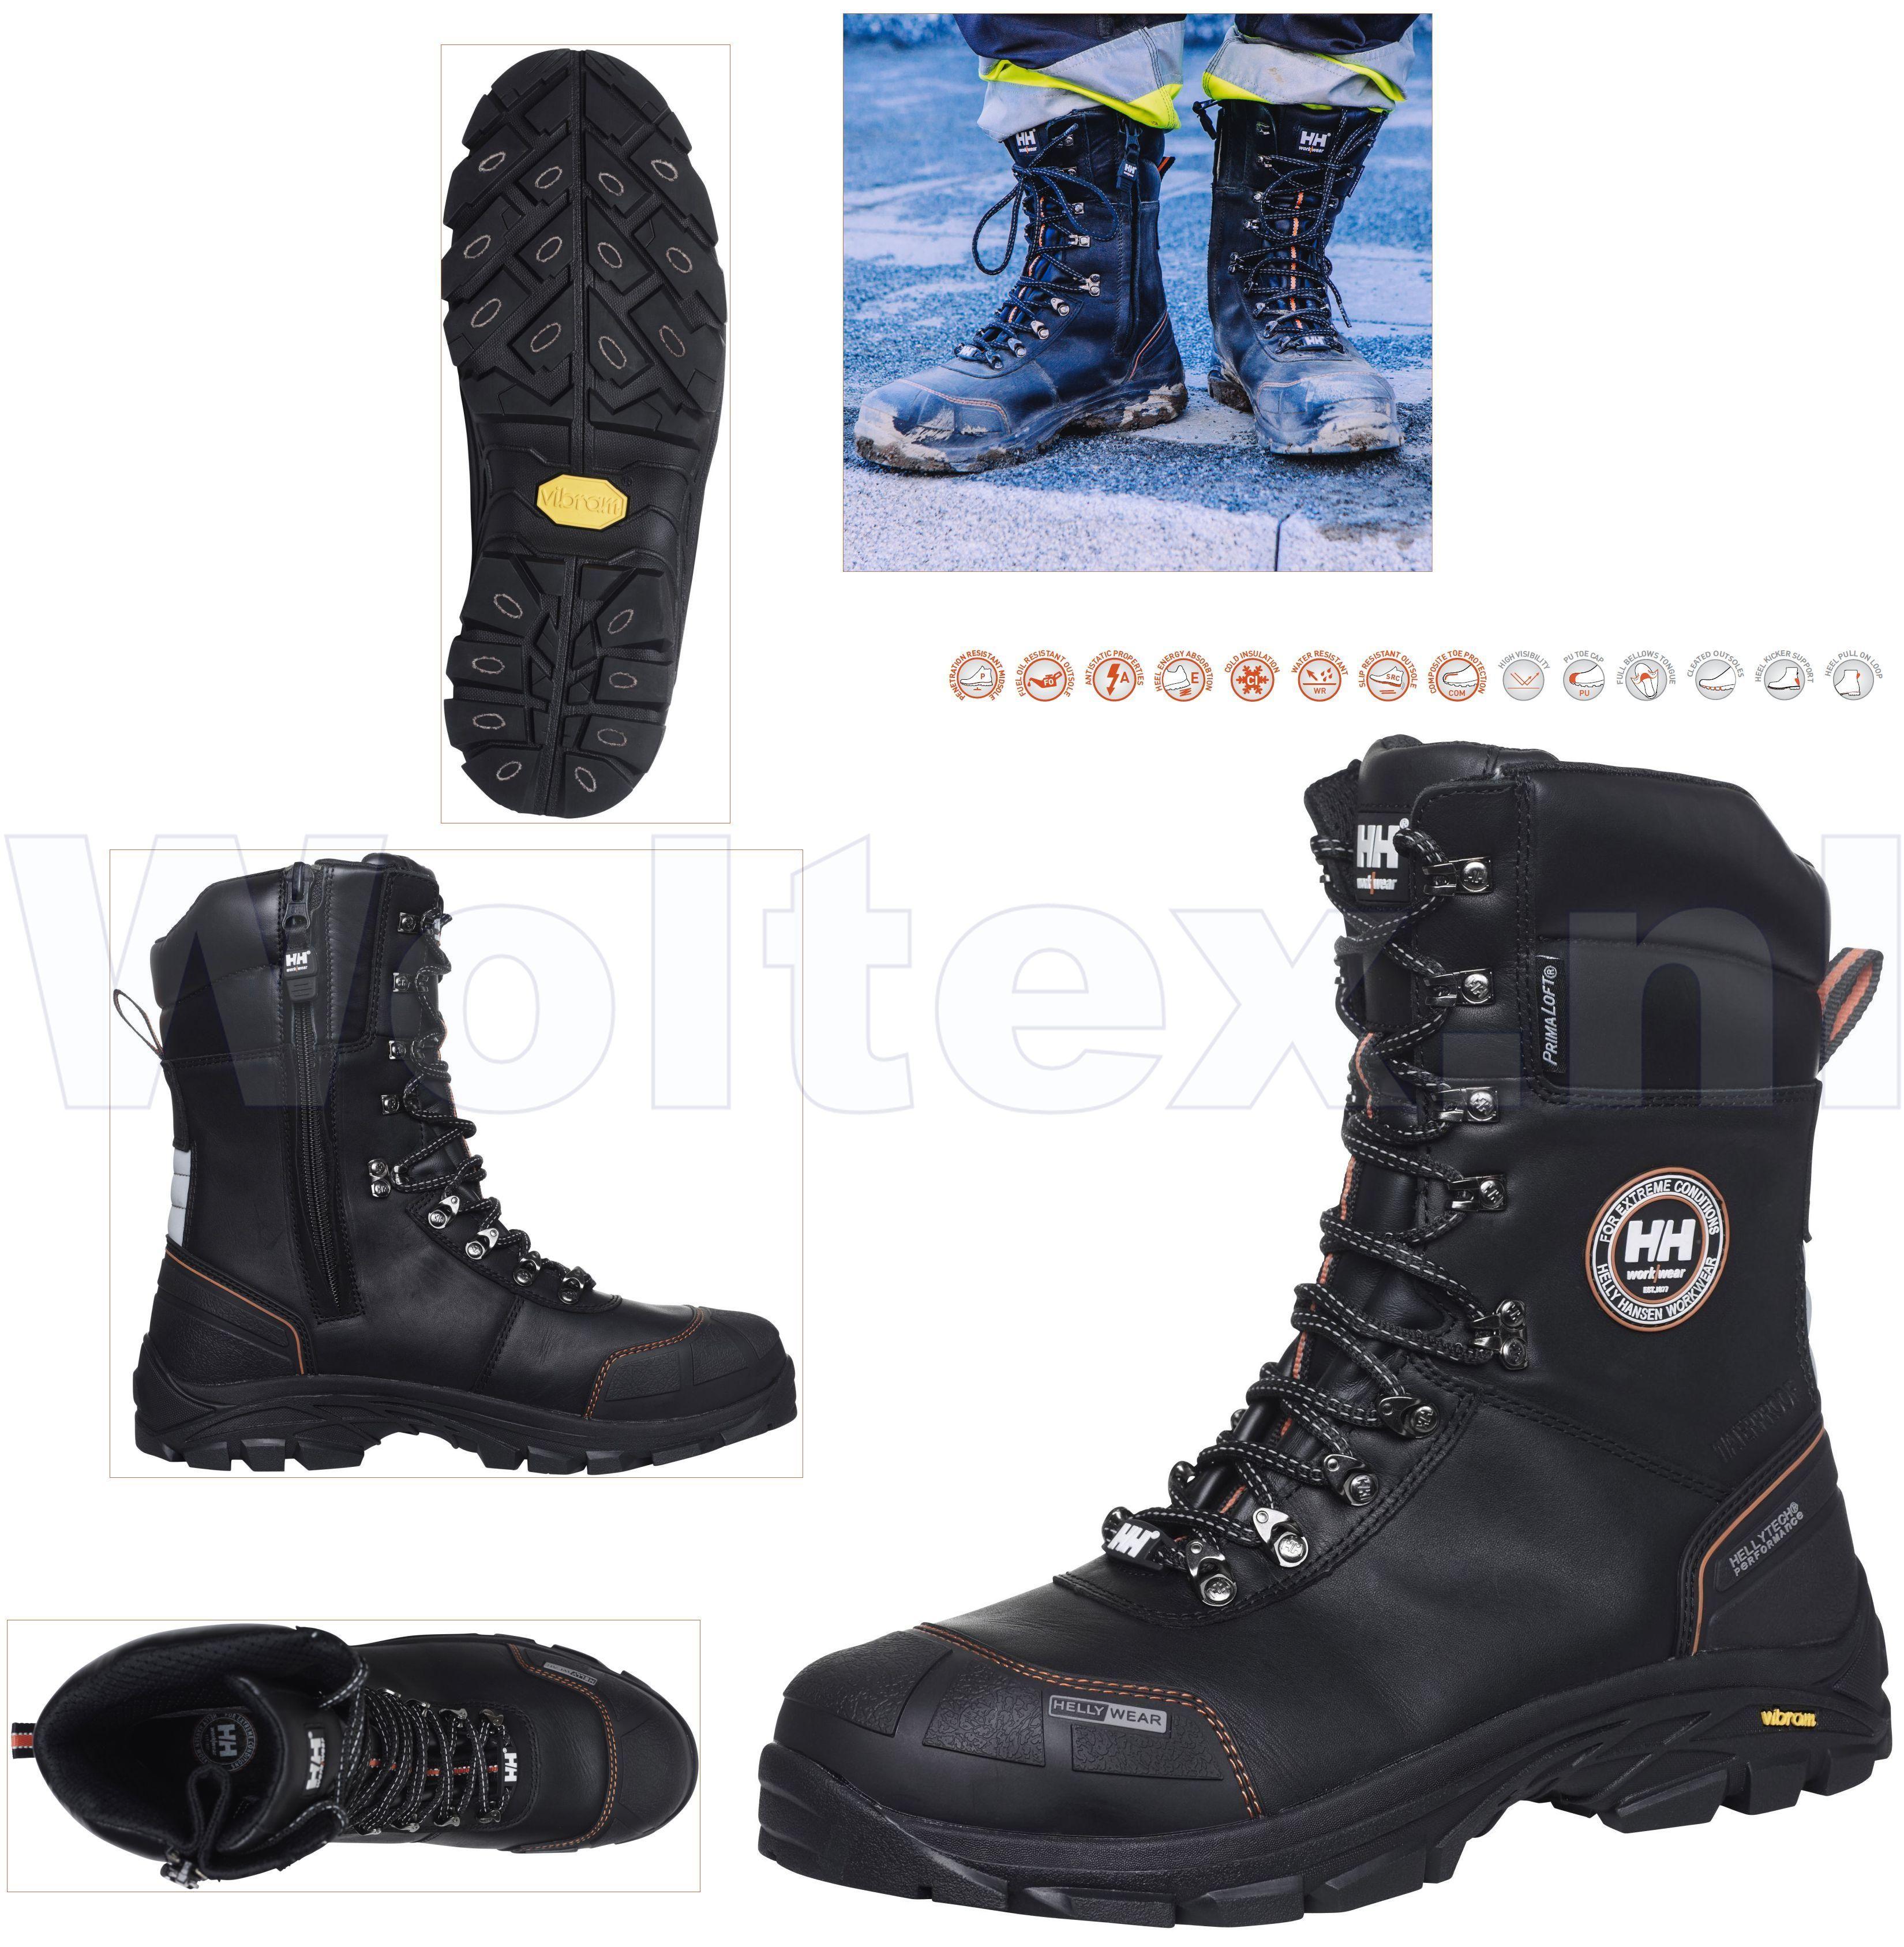 Werkschoenen Hoog.Helly Hansen Winter S3 Werkschoenen Hoog 78301 Chelsea Beschermende